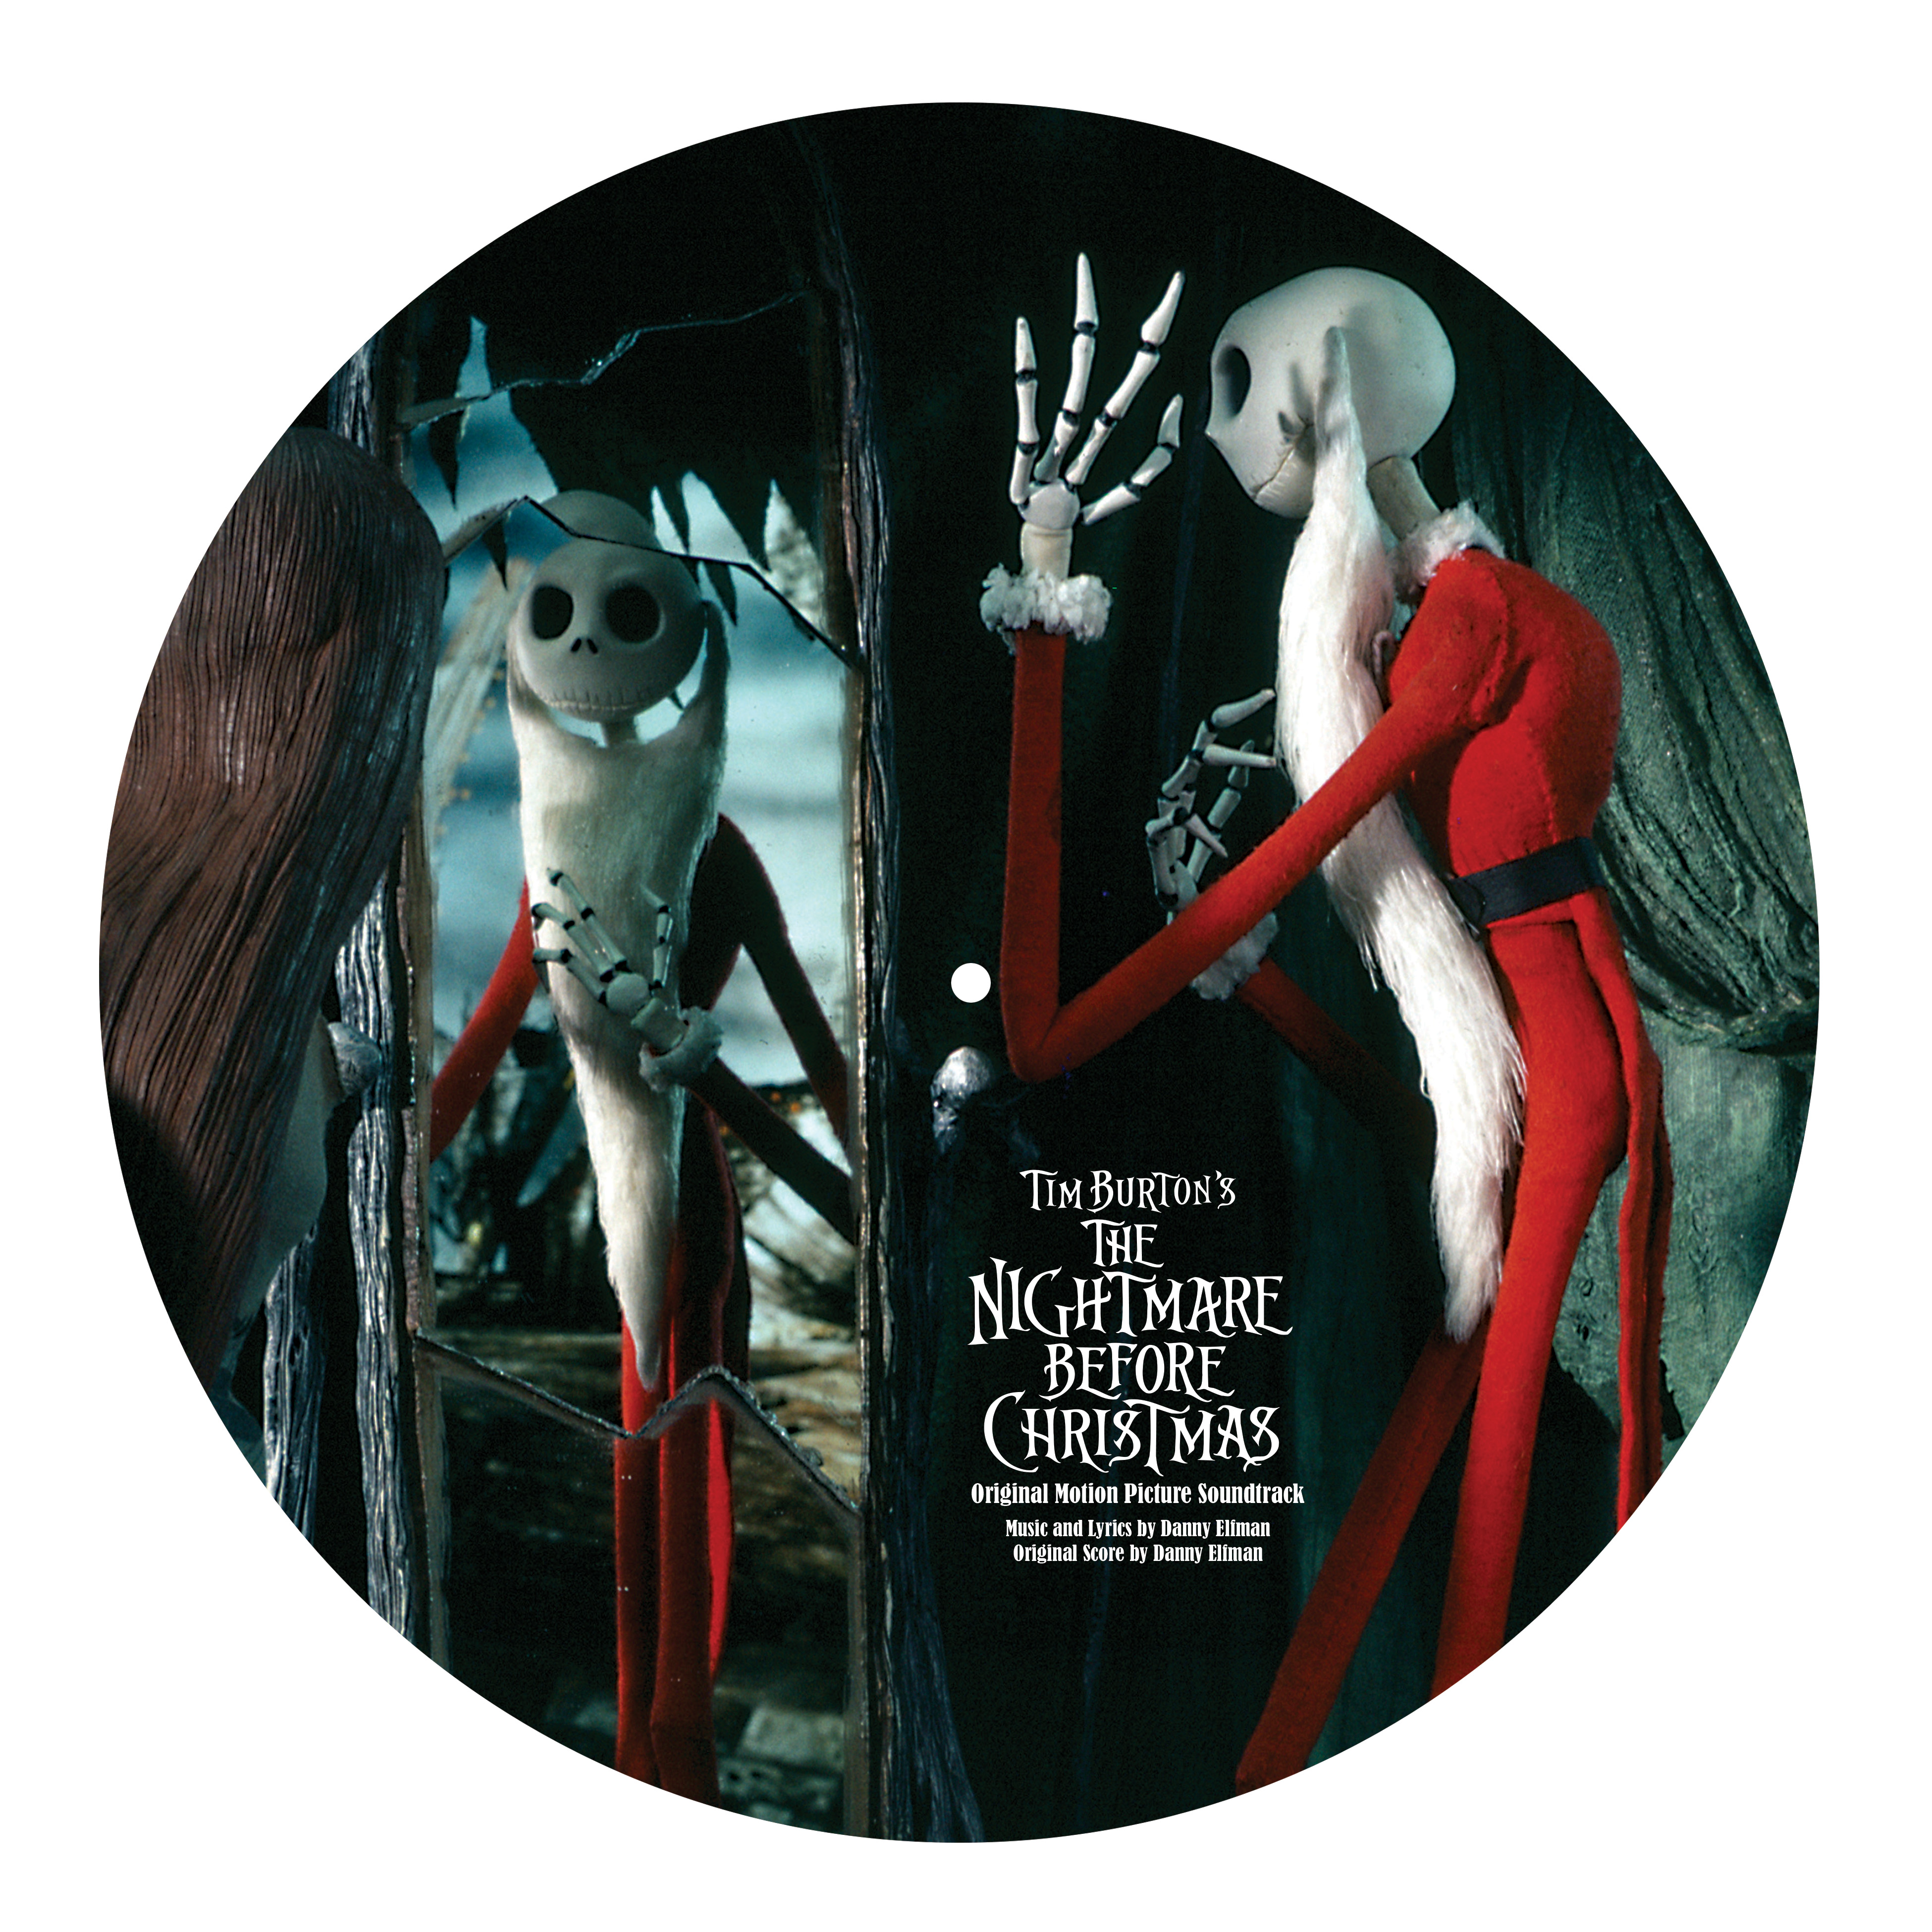 Nightmare Before Christmas Soundtrack Vinyl - Cracker Barrel Old ...